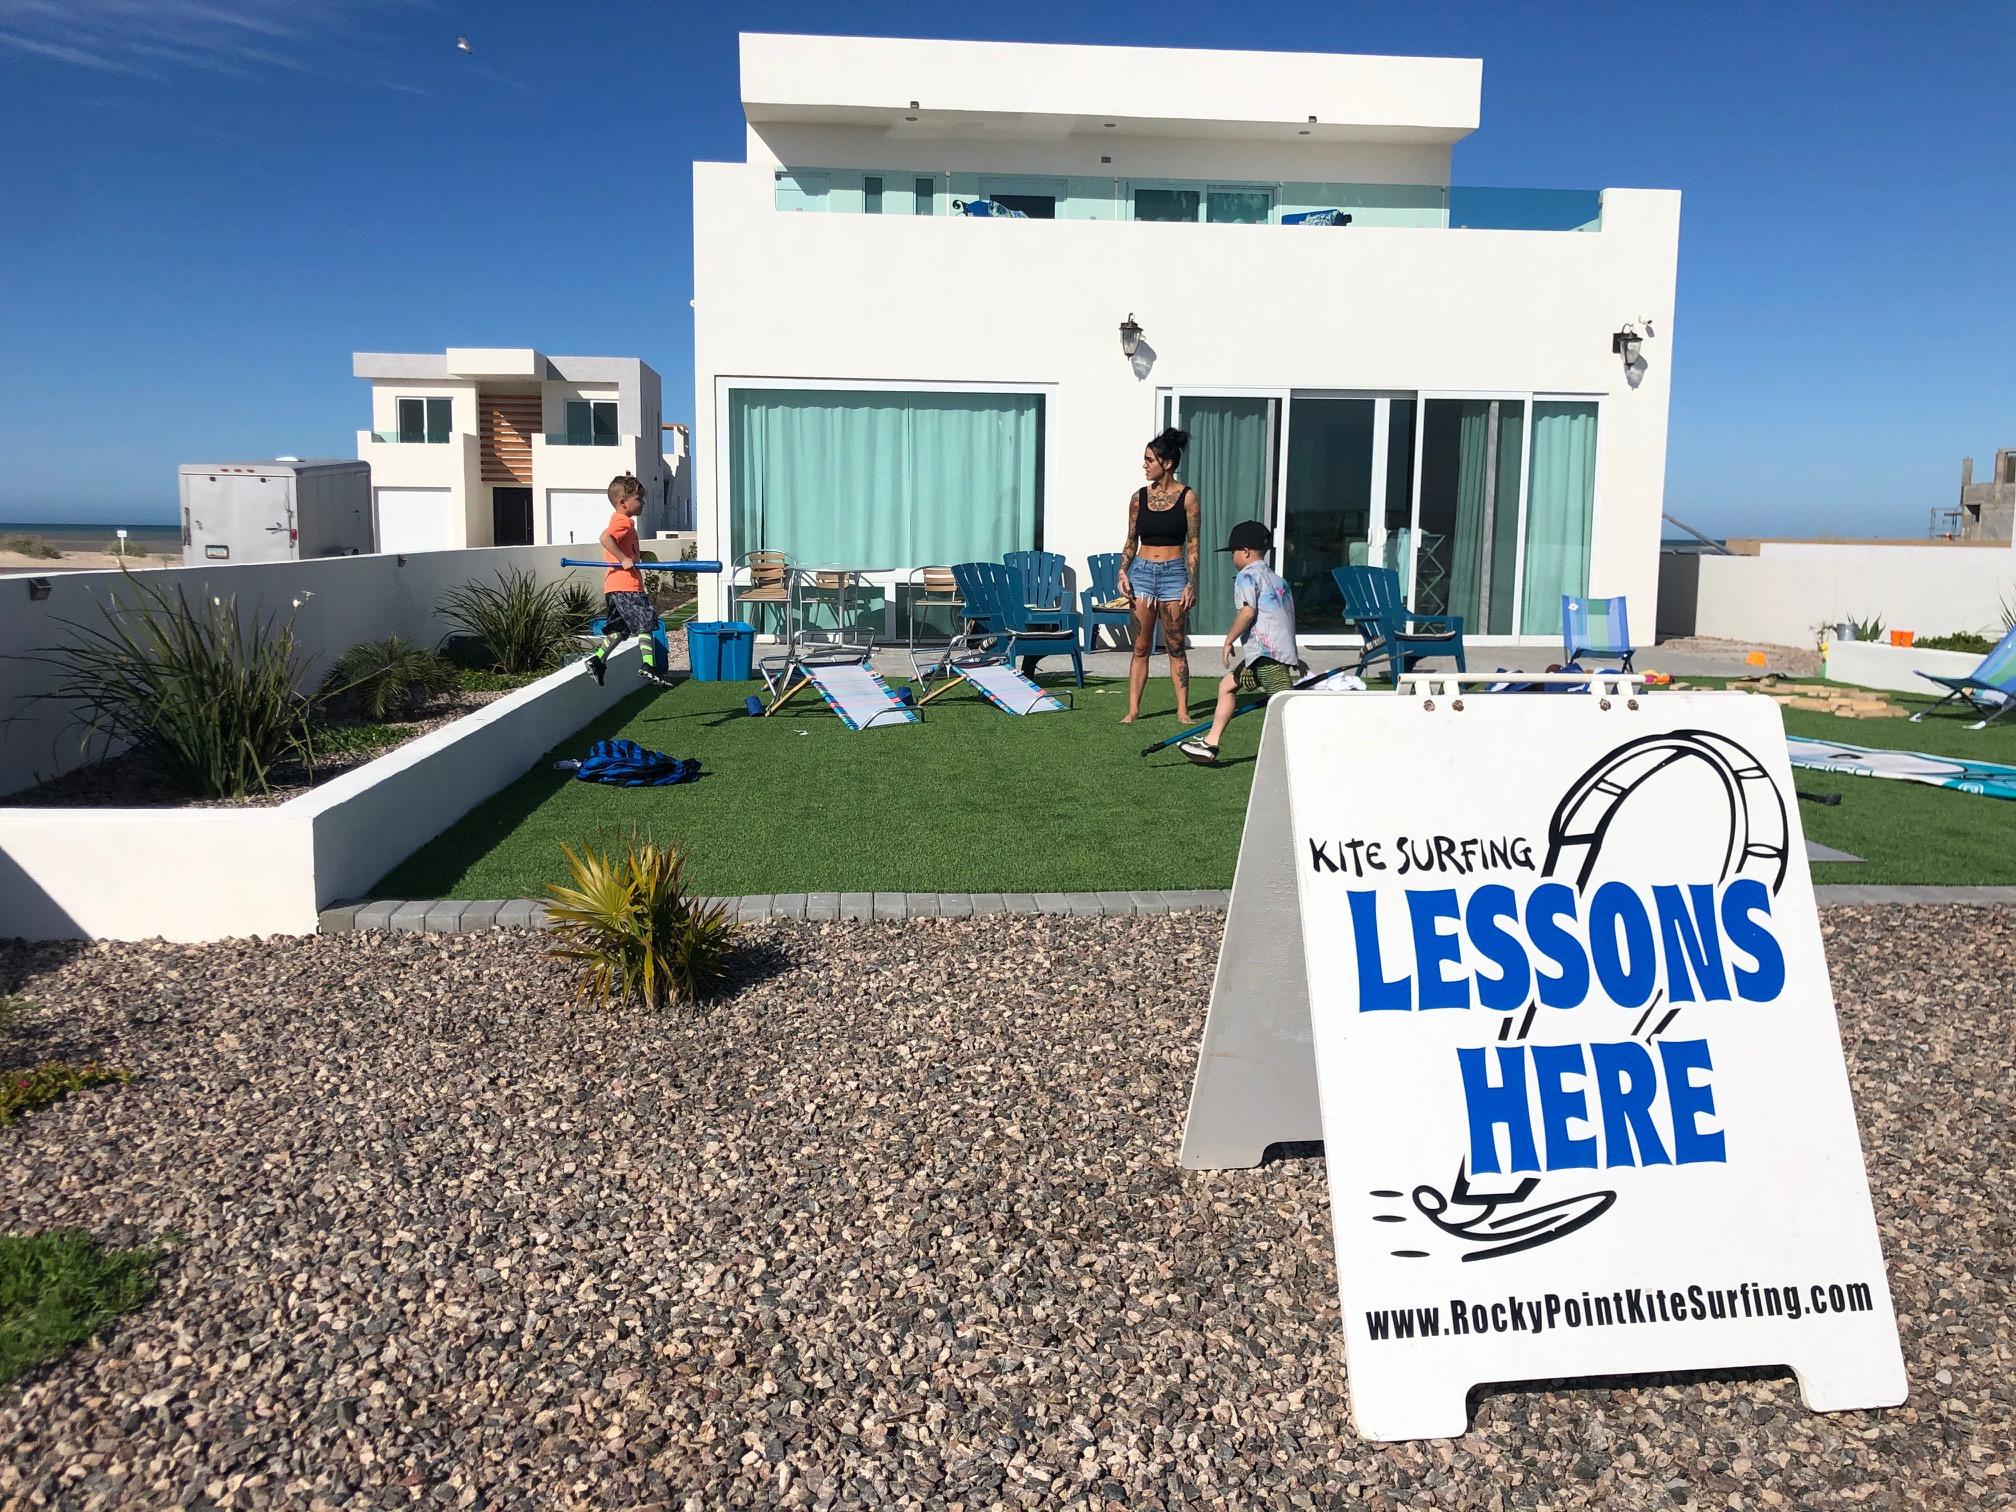 kitesurfing lessons Sea of Cortez, in Puerto Penasco